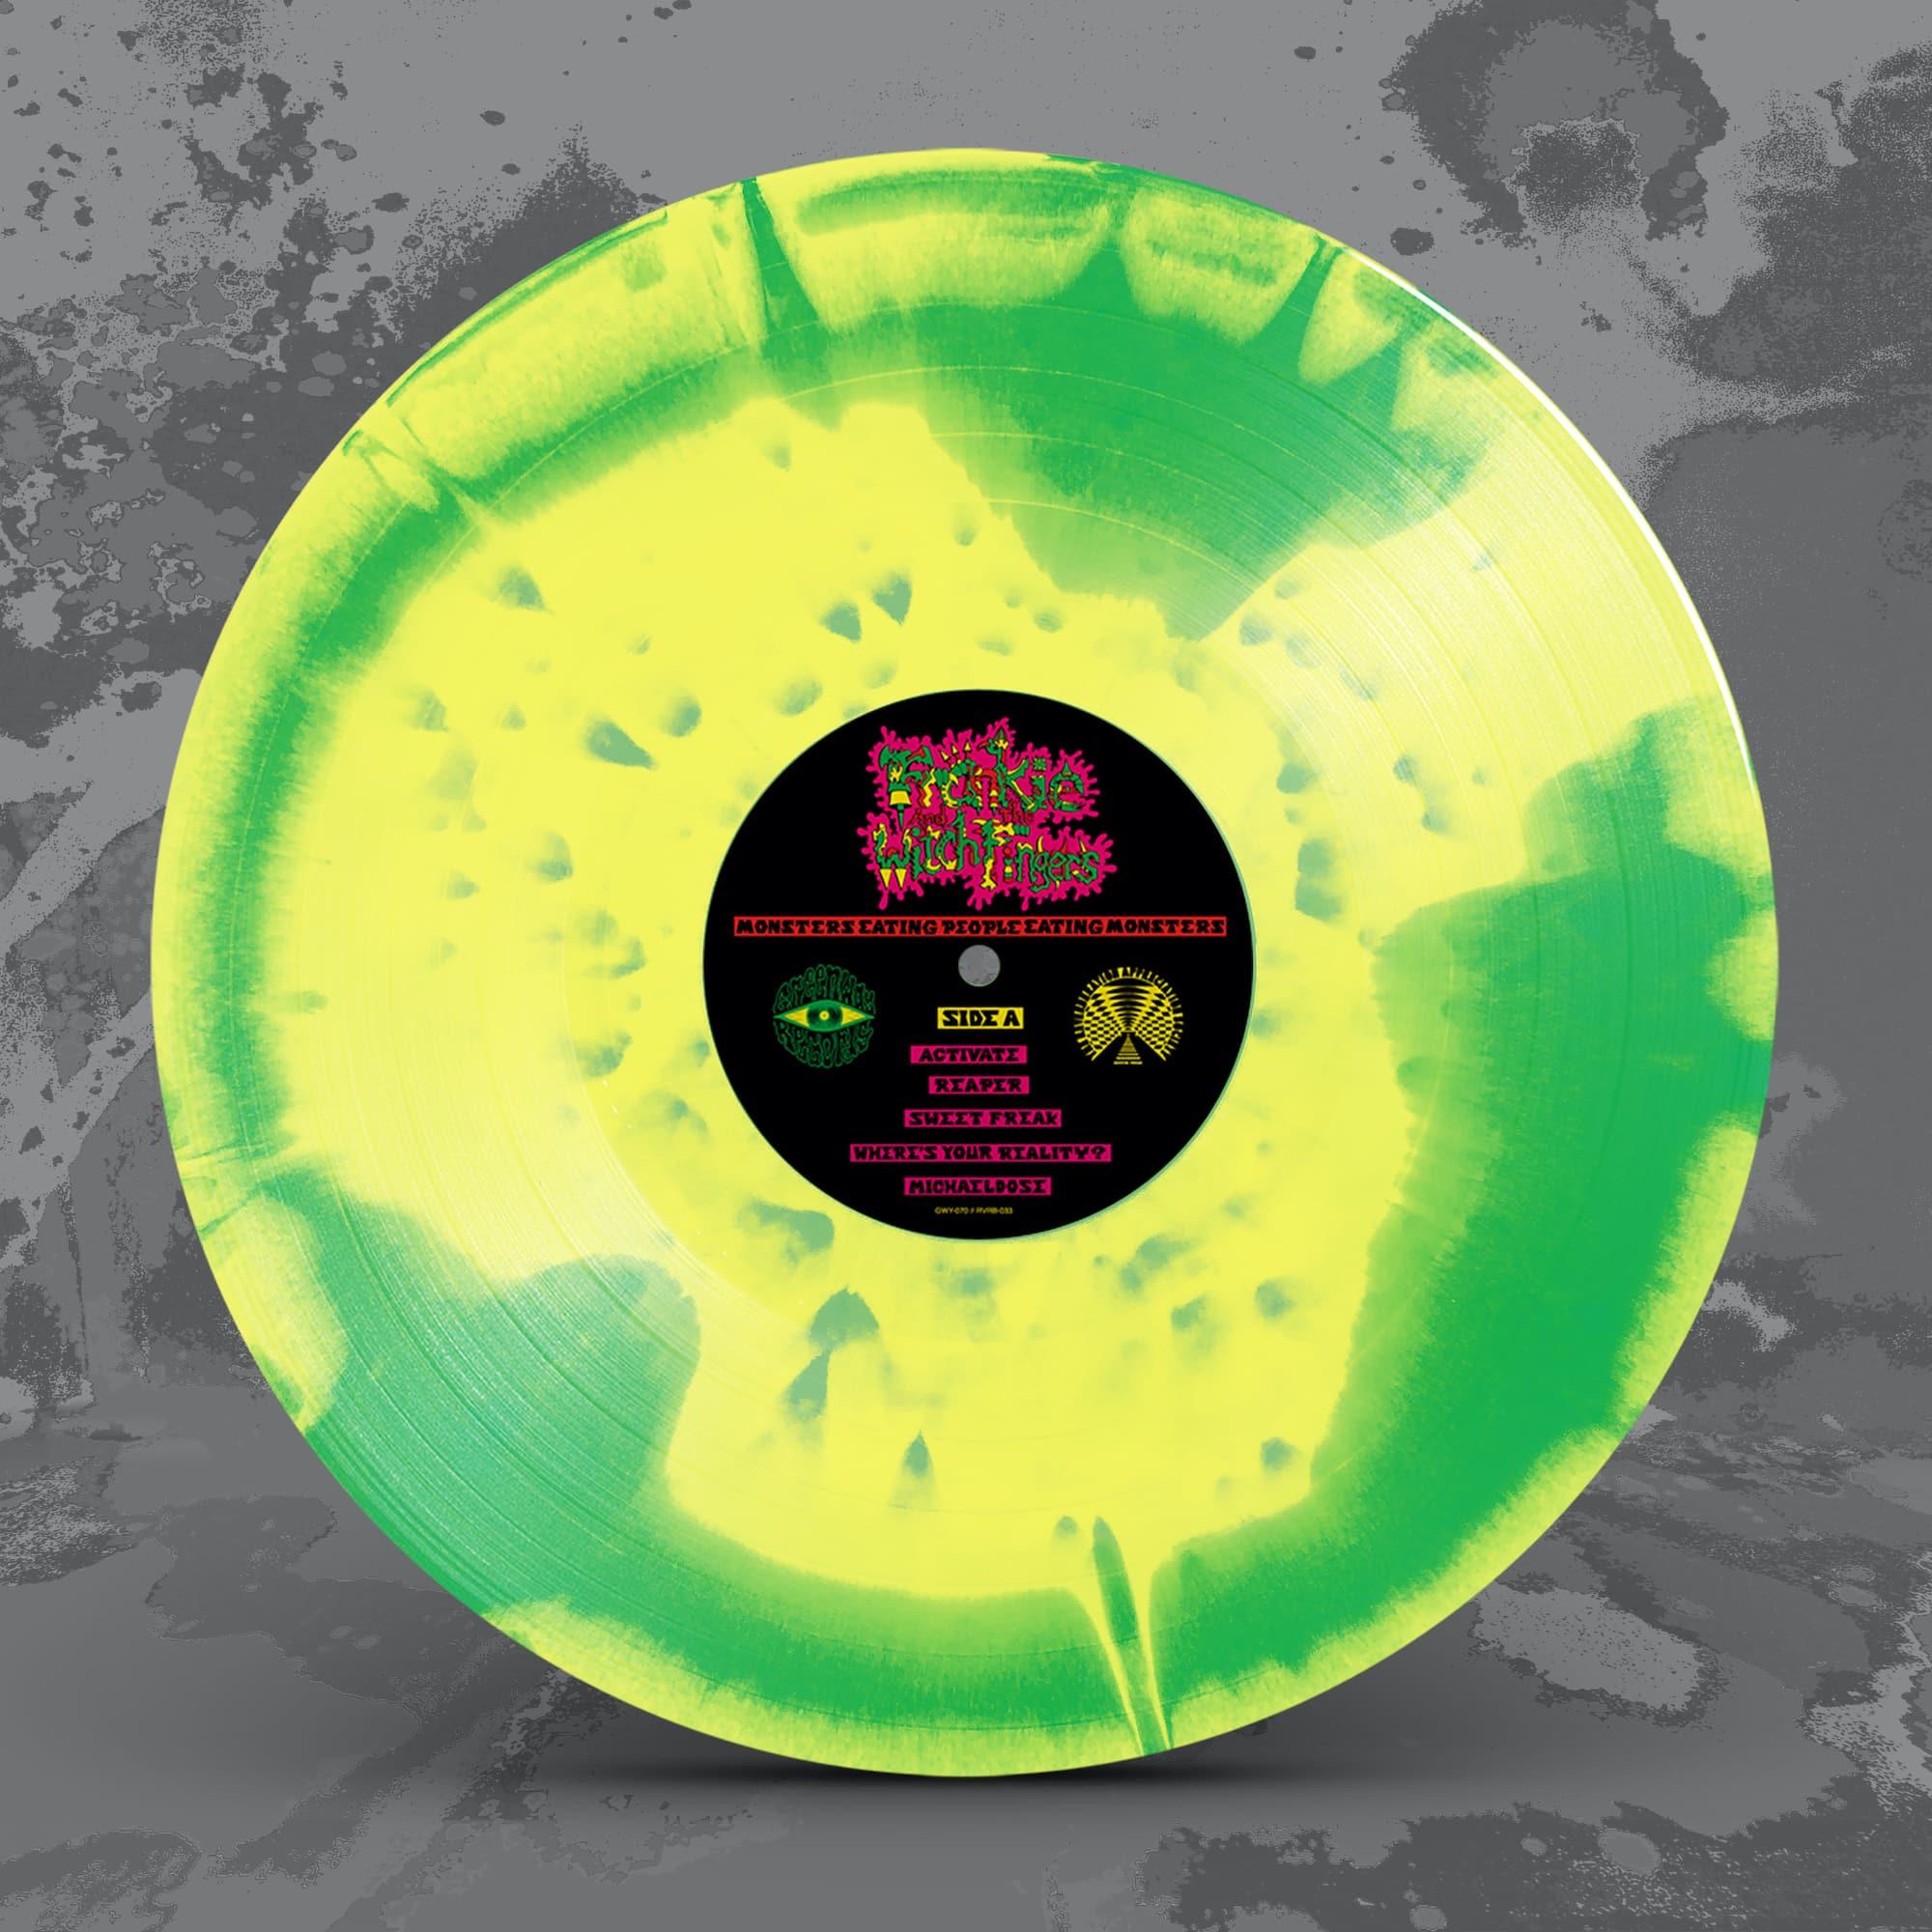 New Frankie Album Pre Order New Video Merch Greenway Records